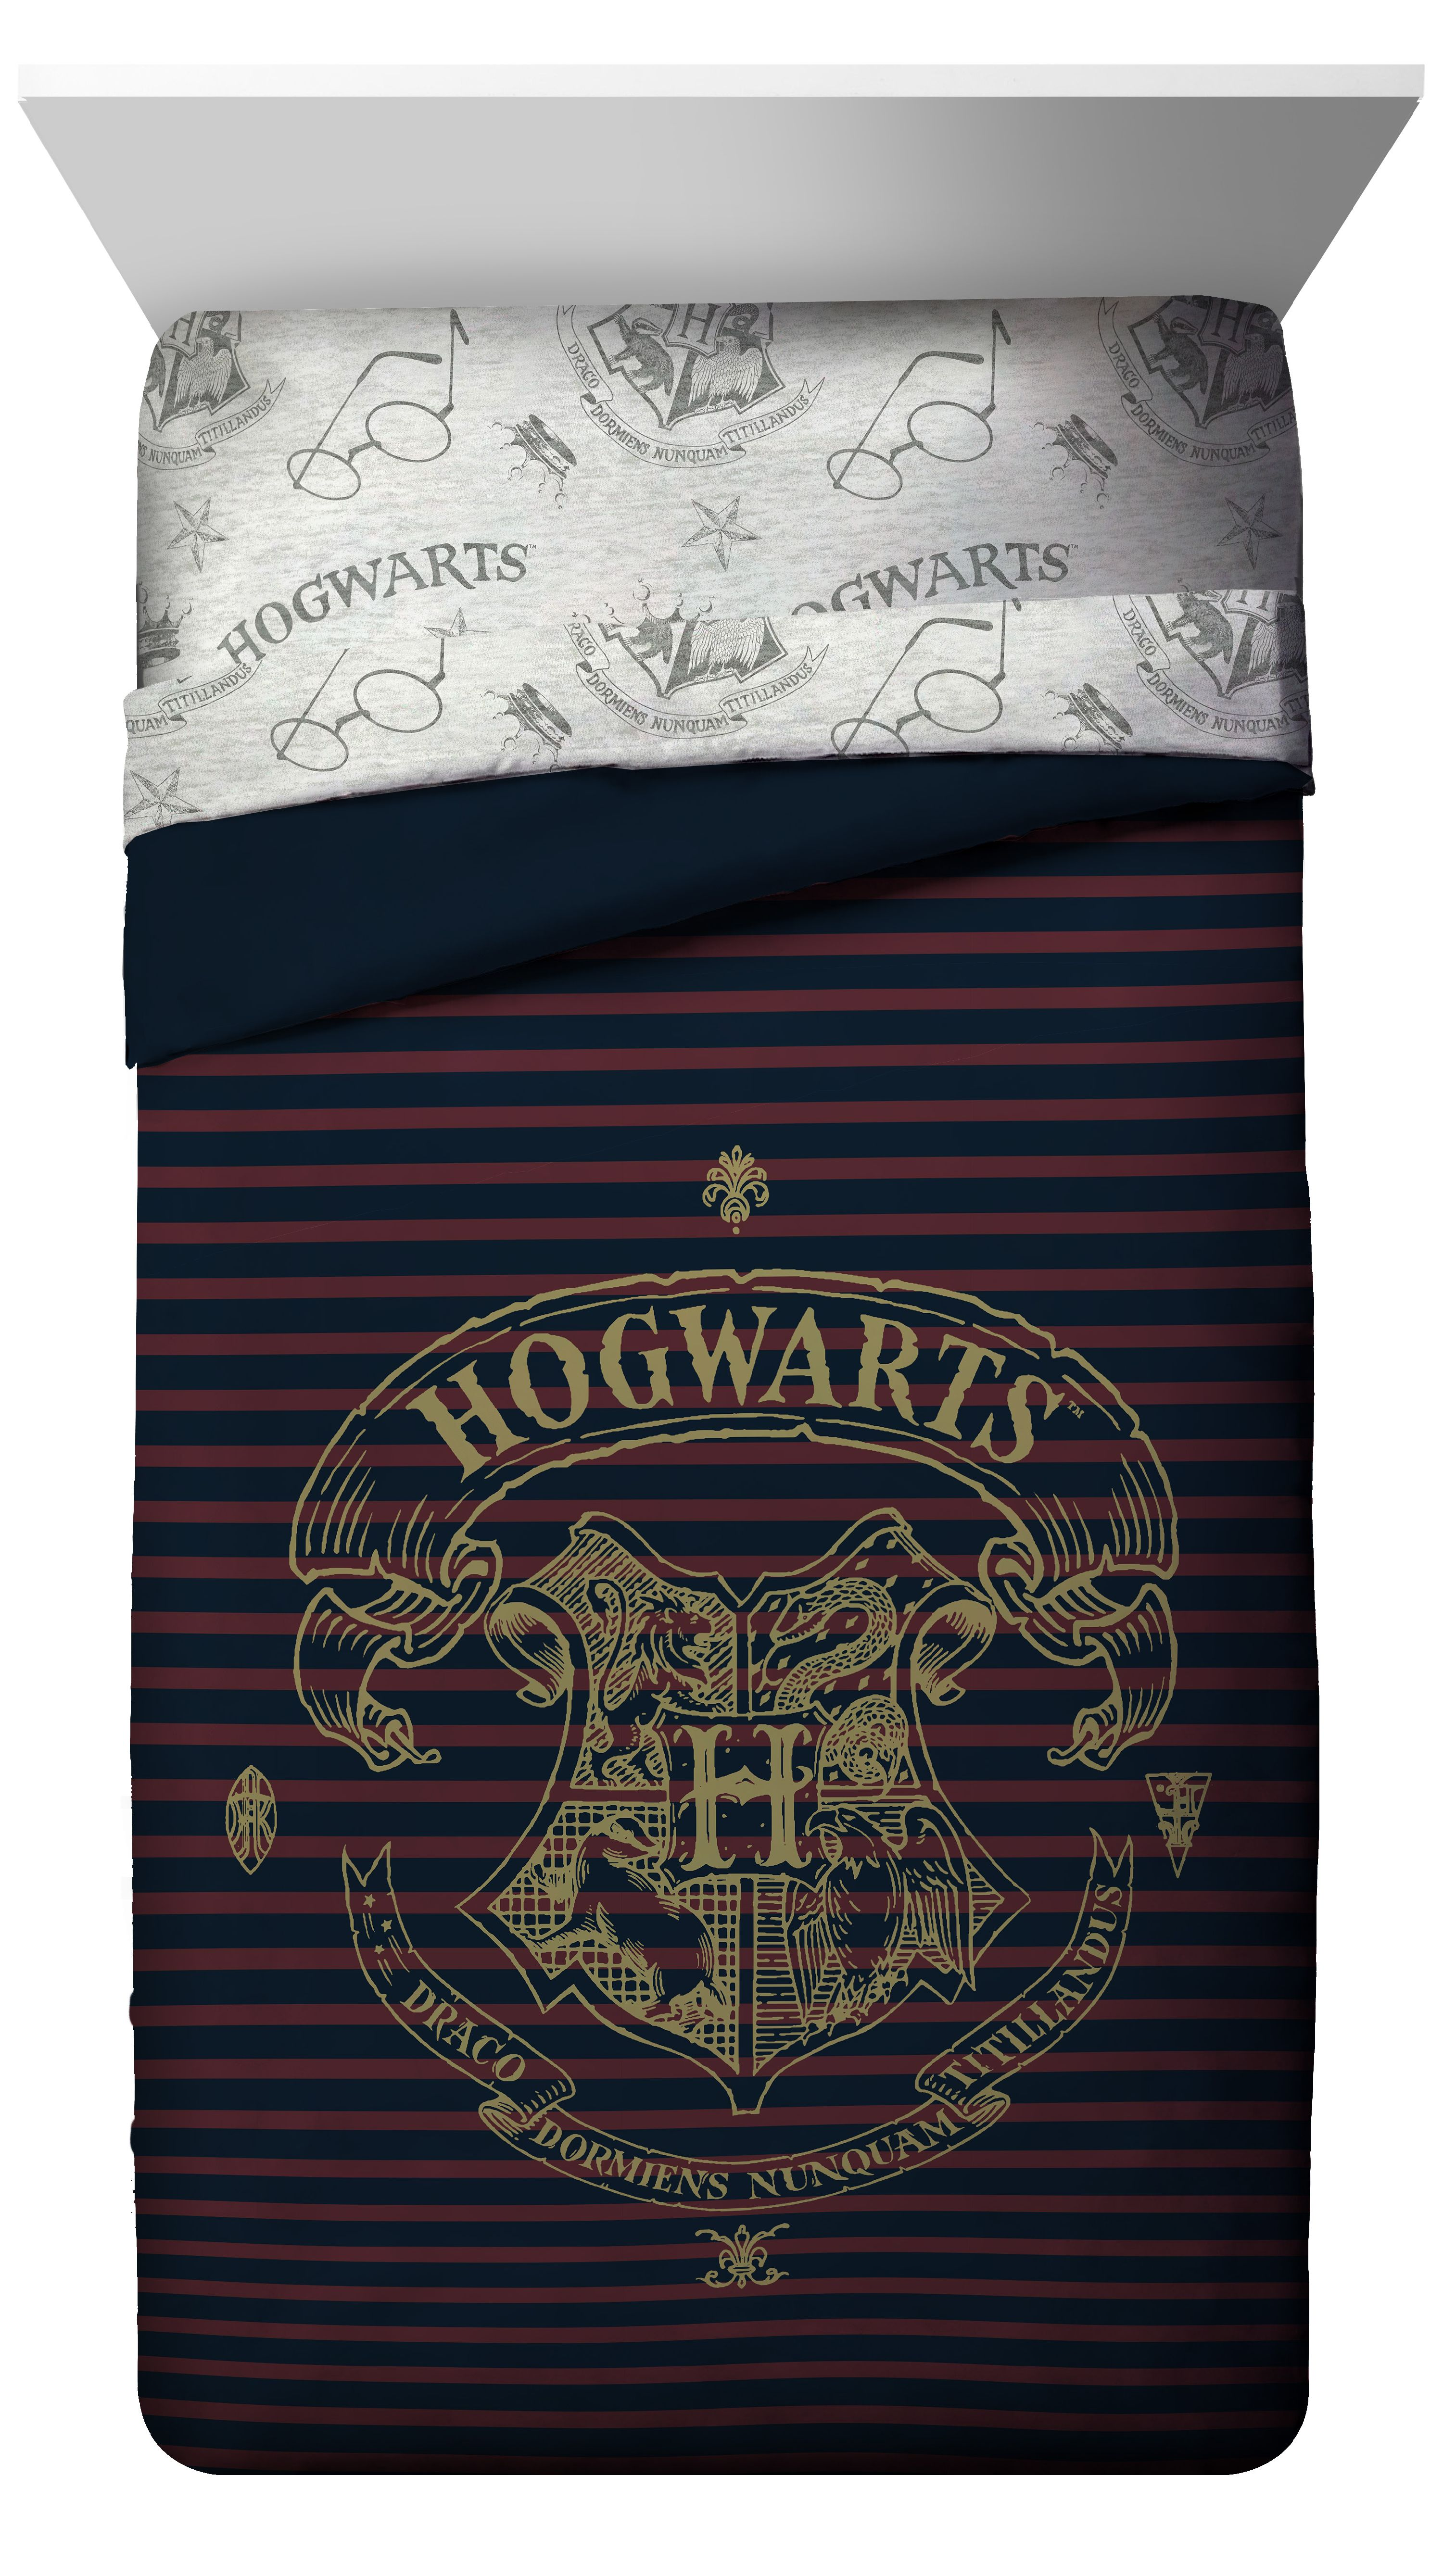 Harry Potter Spellbound Hogwarts Emblem Reversible Twin Full Comforter with Gold Foil... by Jay Franco